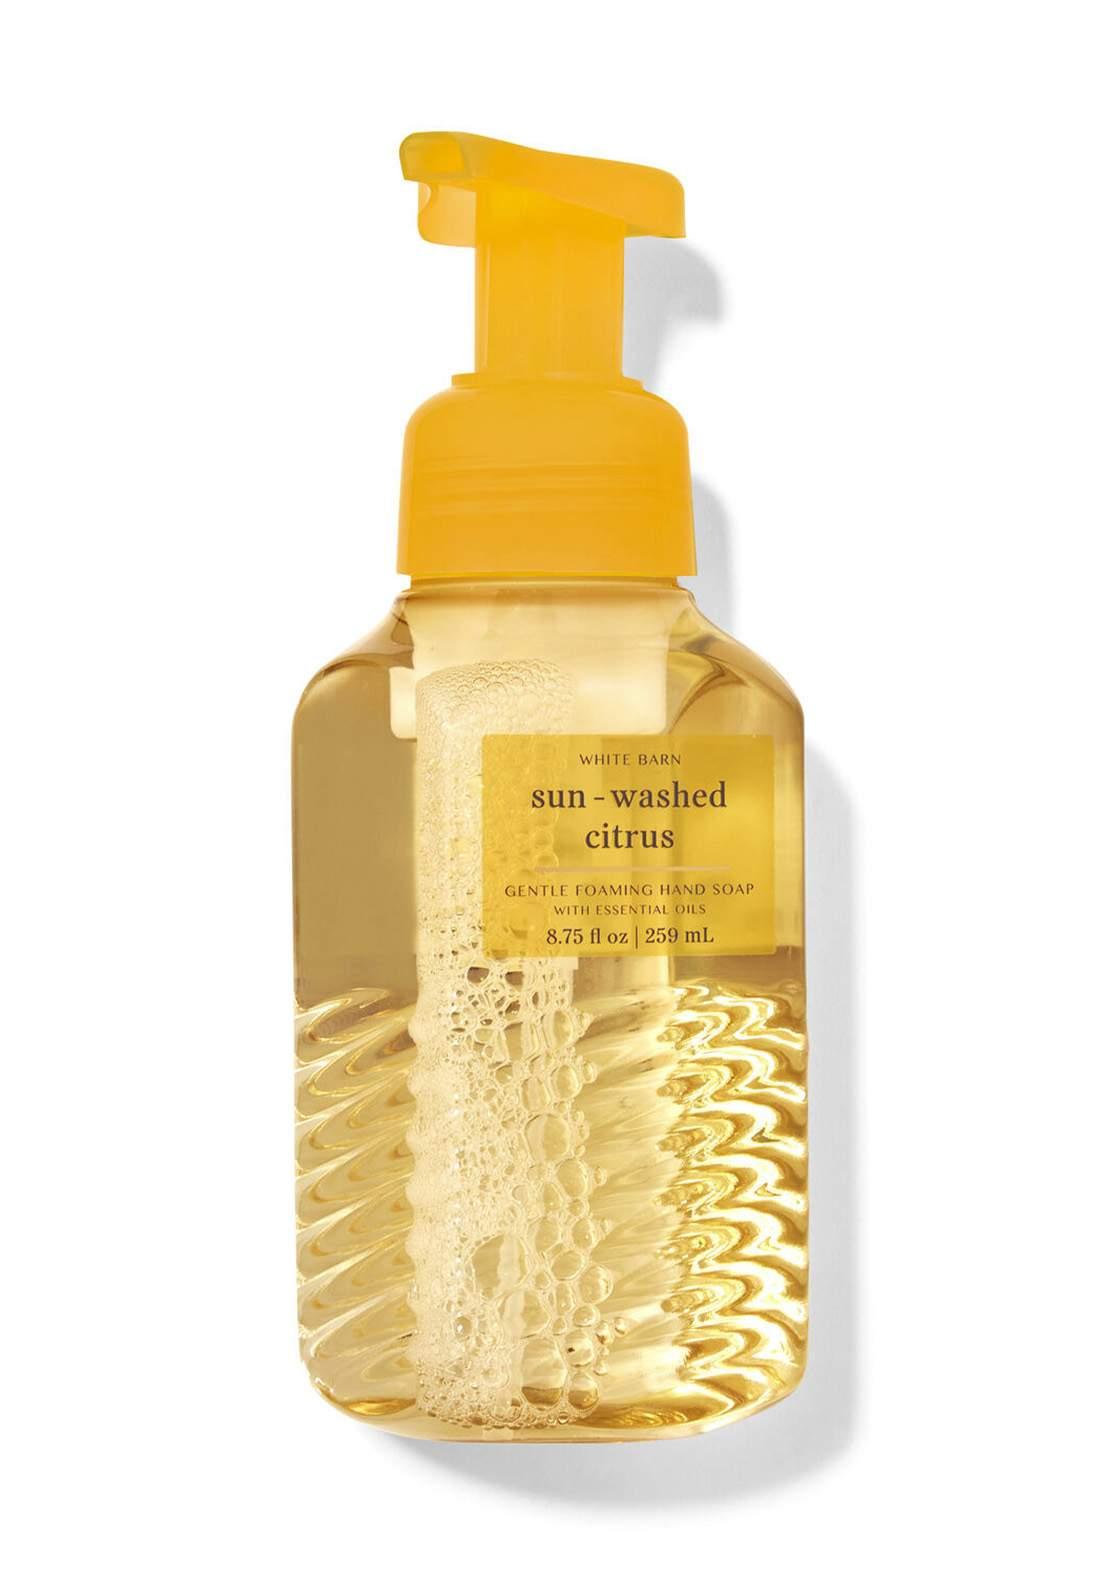 Bath & Body Works Sun-Washed Citrus Gentle Foaming Hand Soap 259ml صابون رغوة لليدين